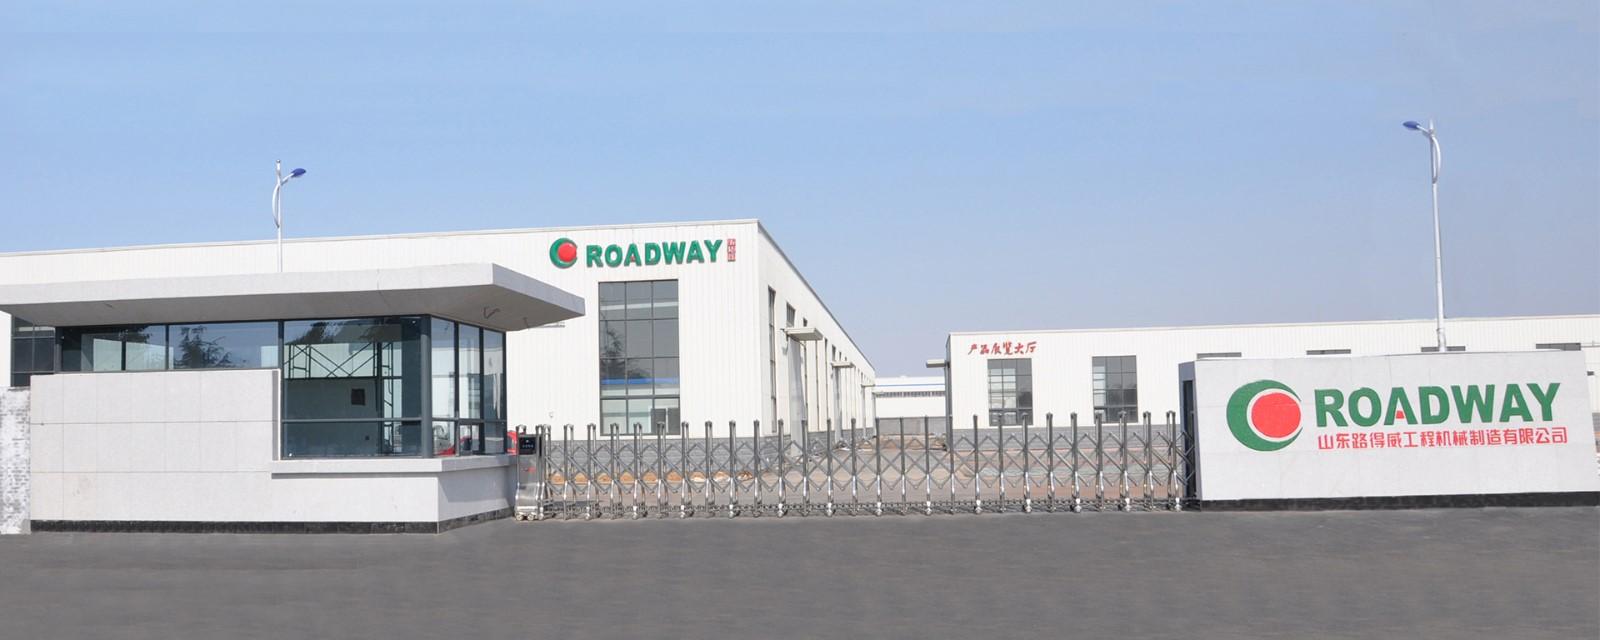 Shandong Roadway Construction Machinery Manufacturing Co., Ltd